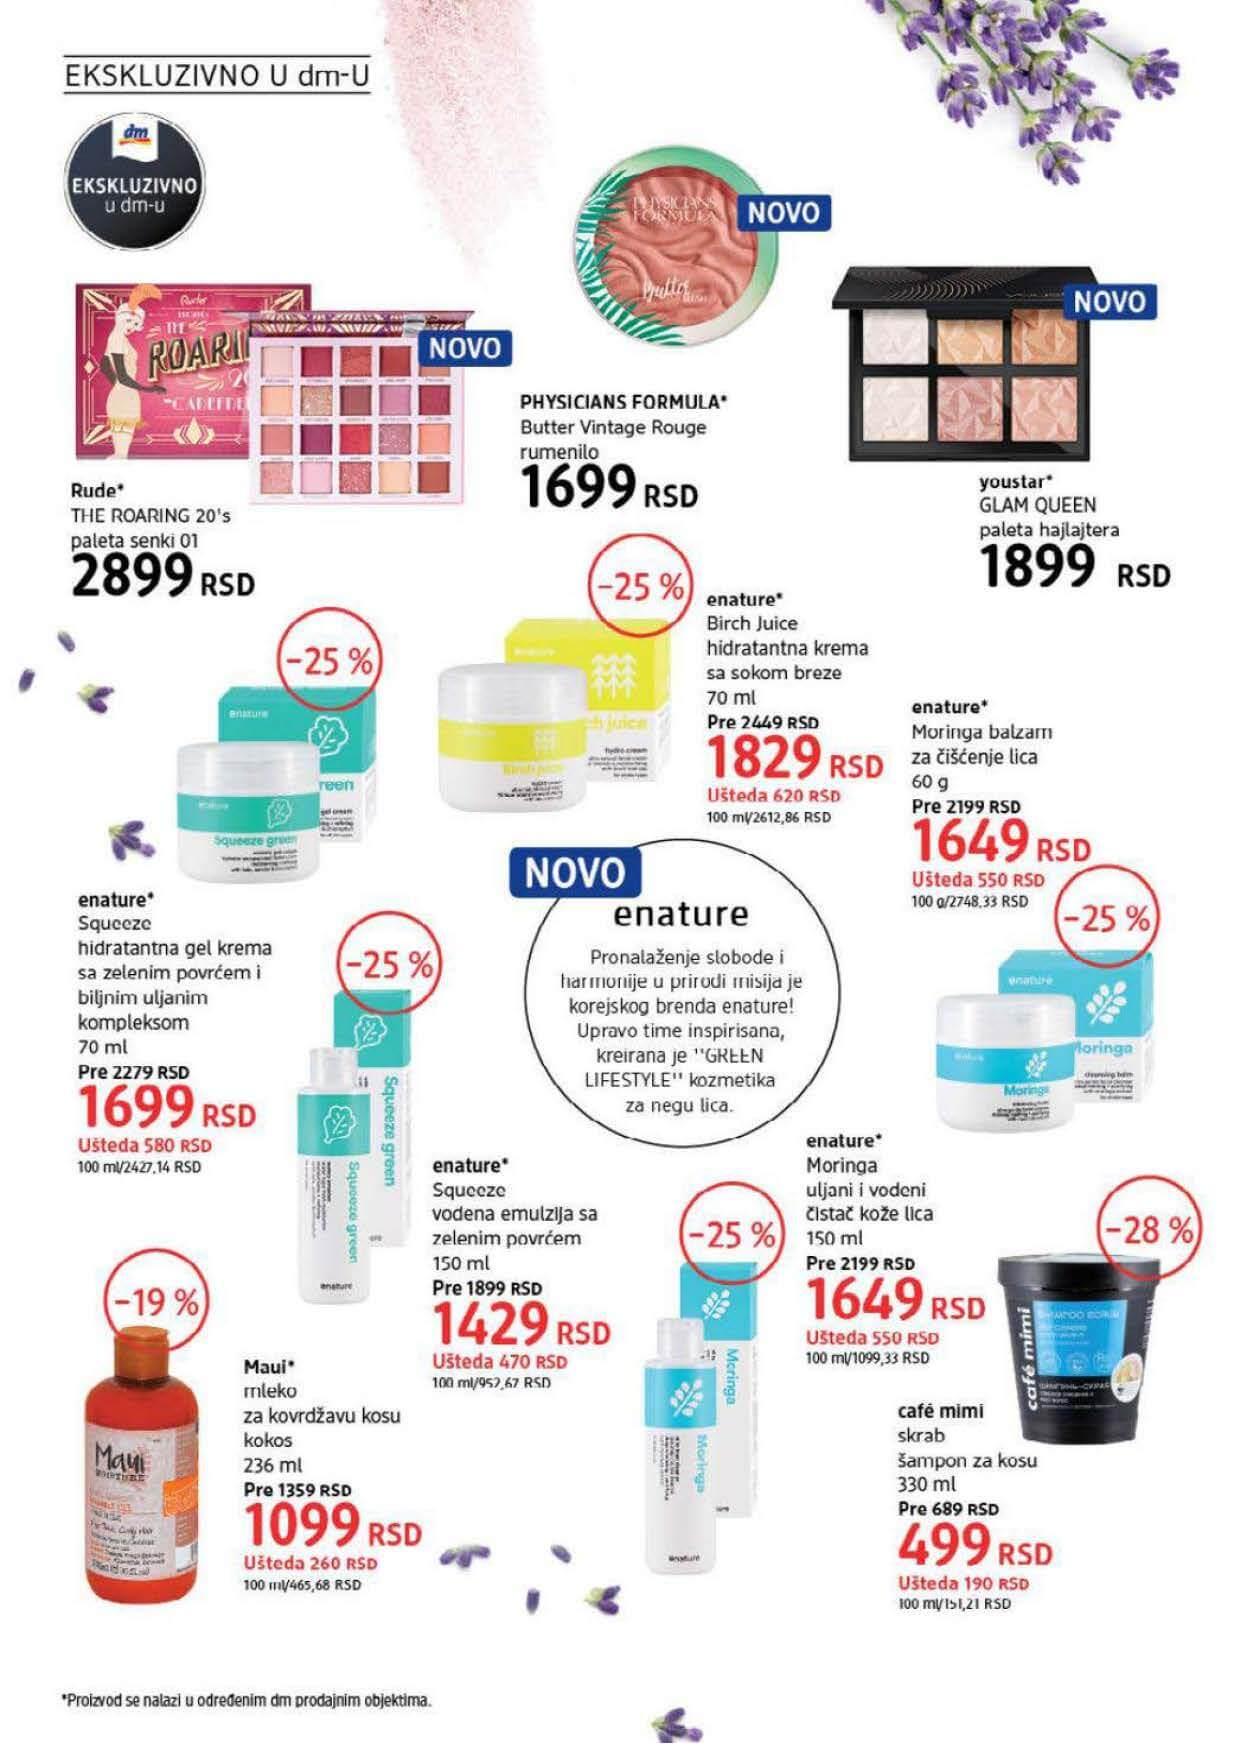 DM Katalog Srbija SEPTEMBAR 2021 1.9.2021. 30.9.2021. Page 08